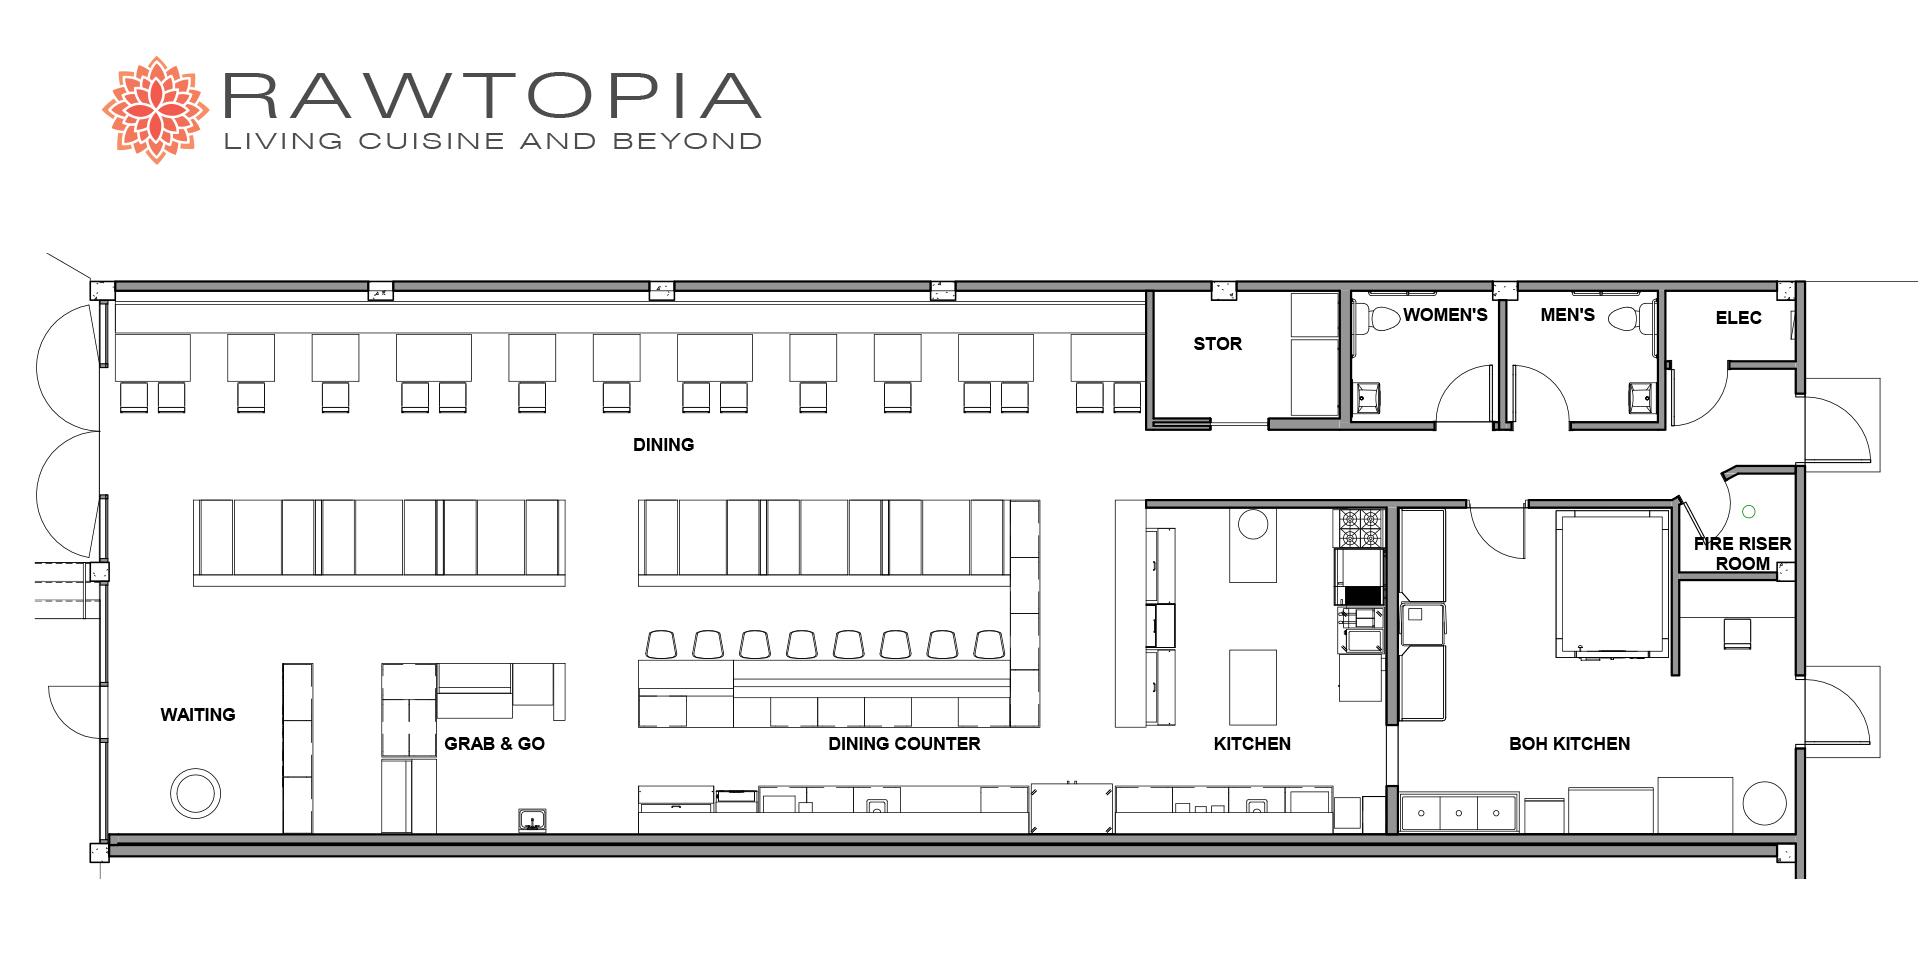 SparanoMooneyArchitecture_Rawtopia_Floor Plan.jpg